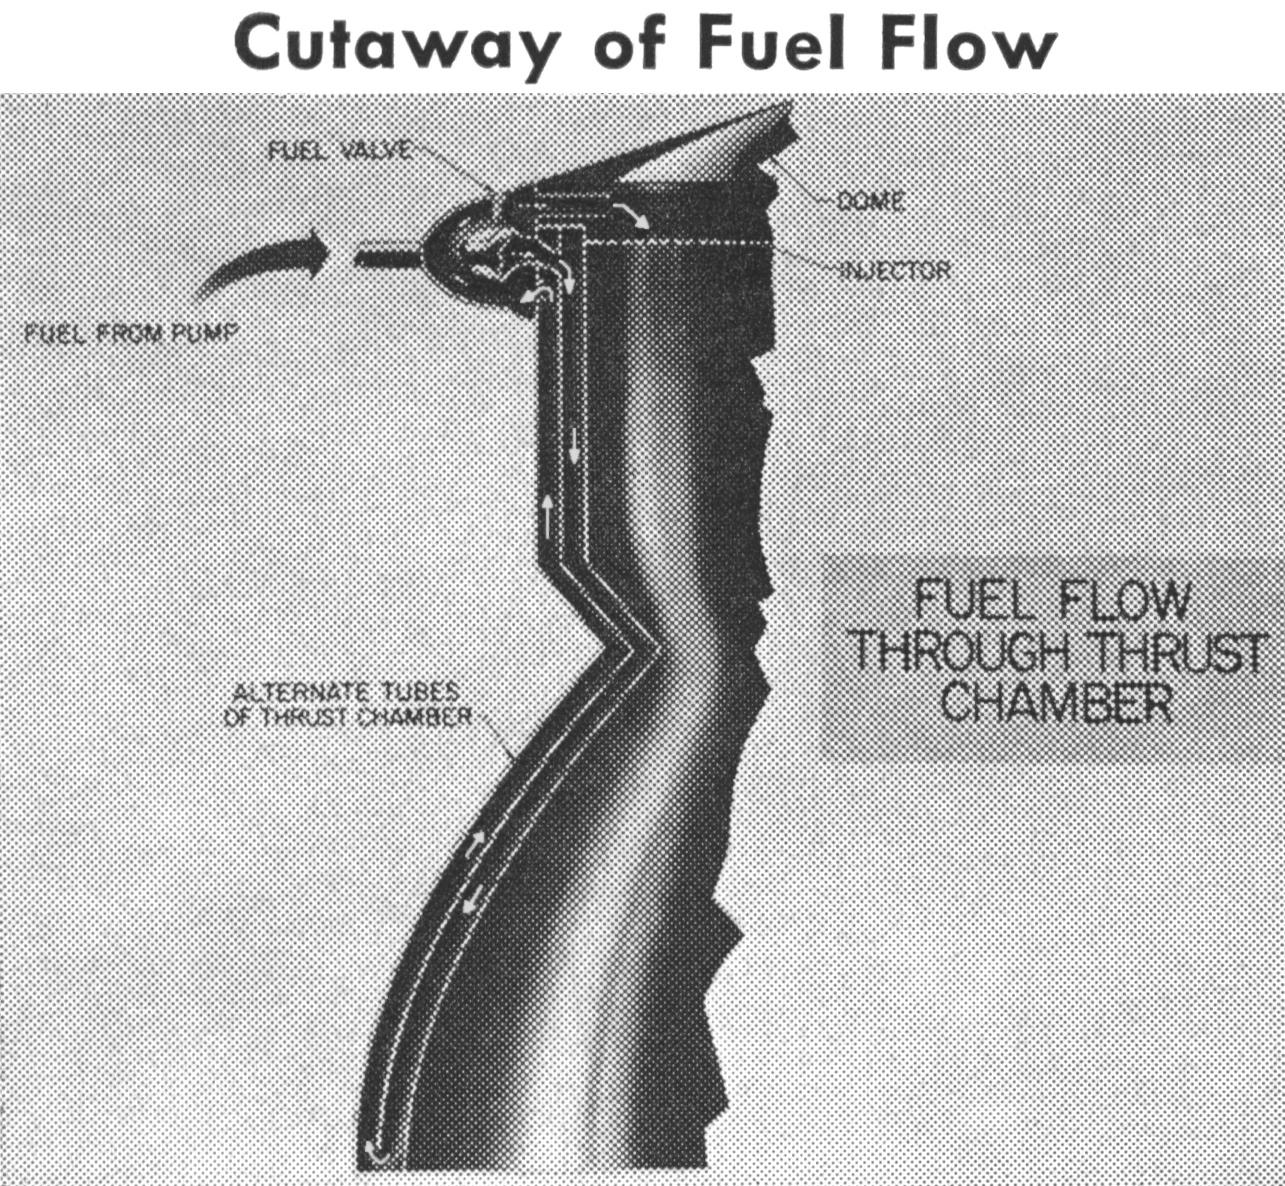 F 1 Engine Thrust Chamber Saturn V F1 Diagram Rocket Cut Away Combustion Fuel Flow Regenerative Cooling